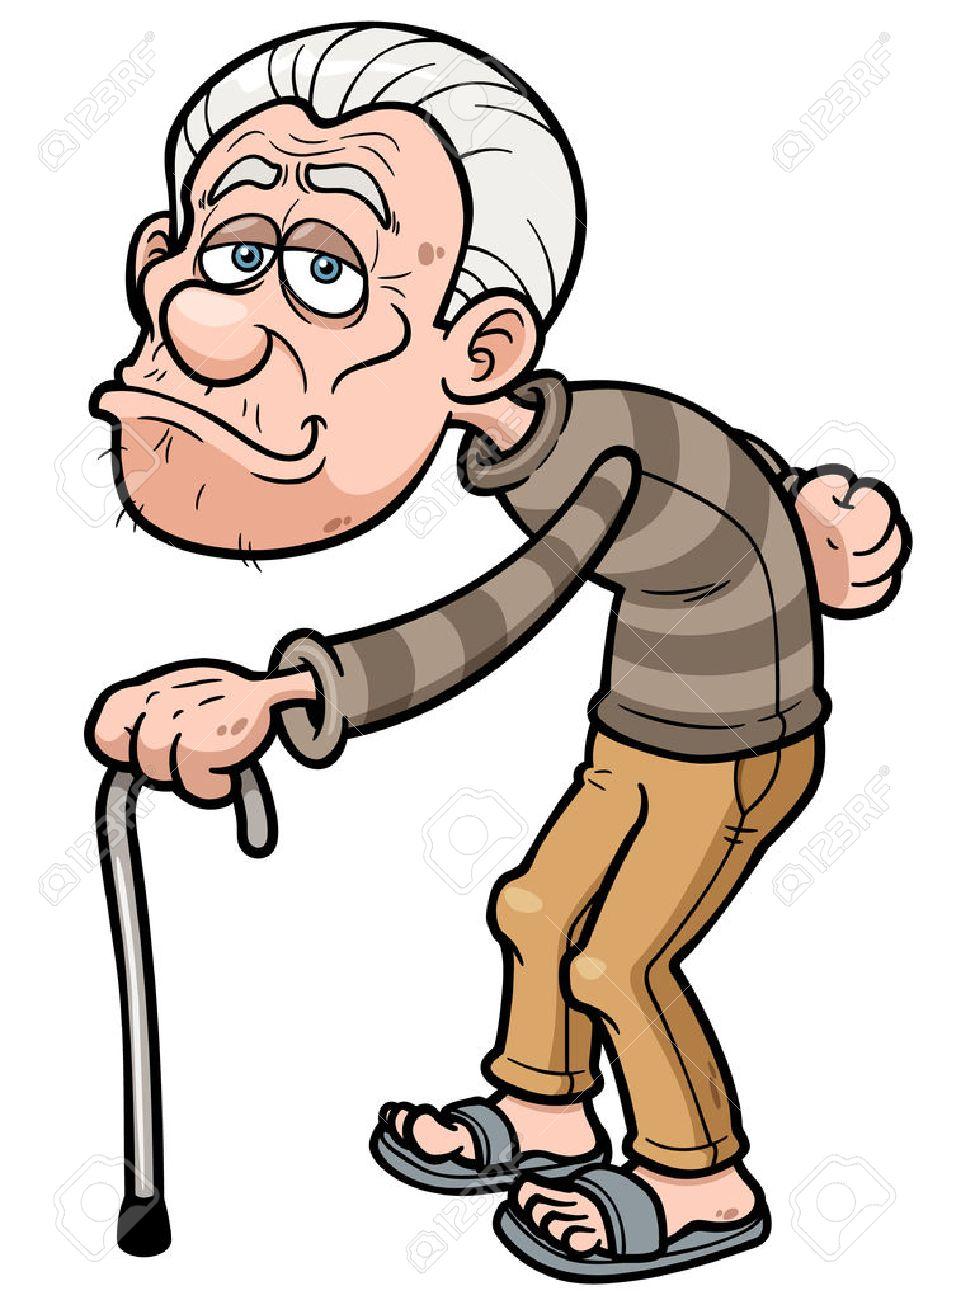 vector illustration of cartoon old man royalty free cliparts rh 123rf com old man cartoon charactoer old man cartoons images free